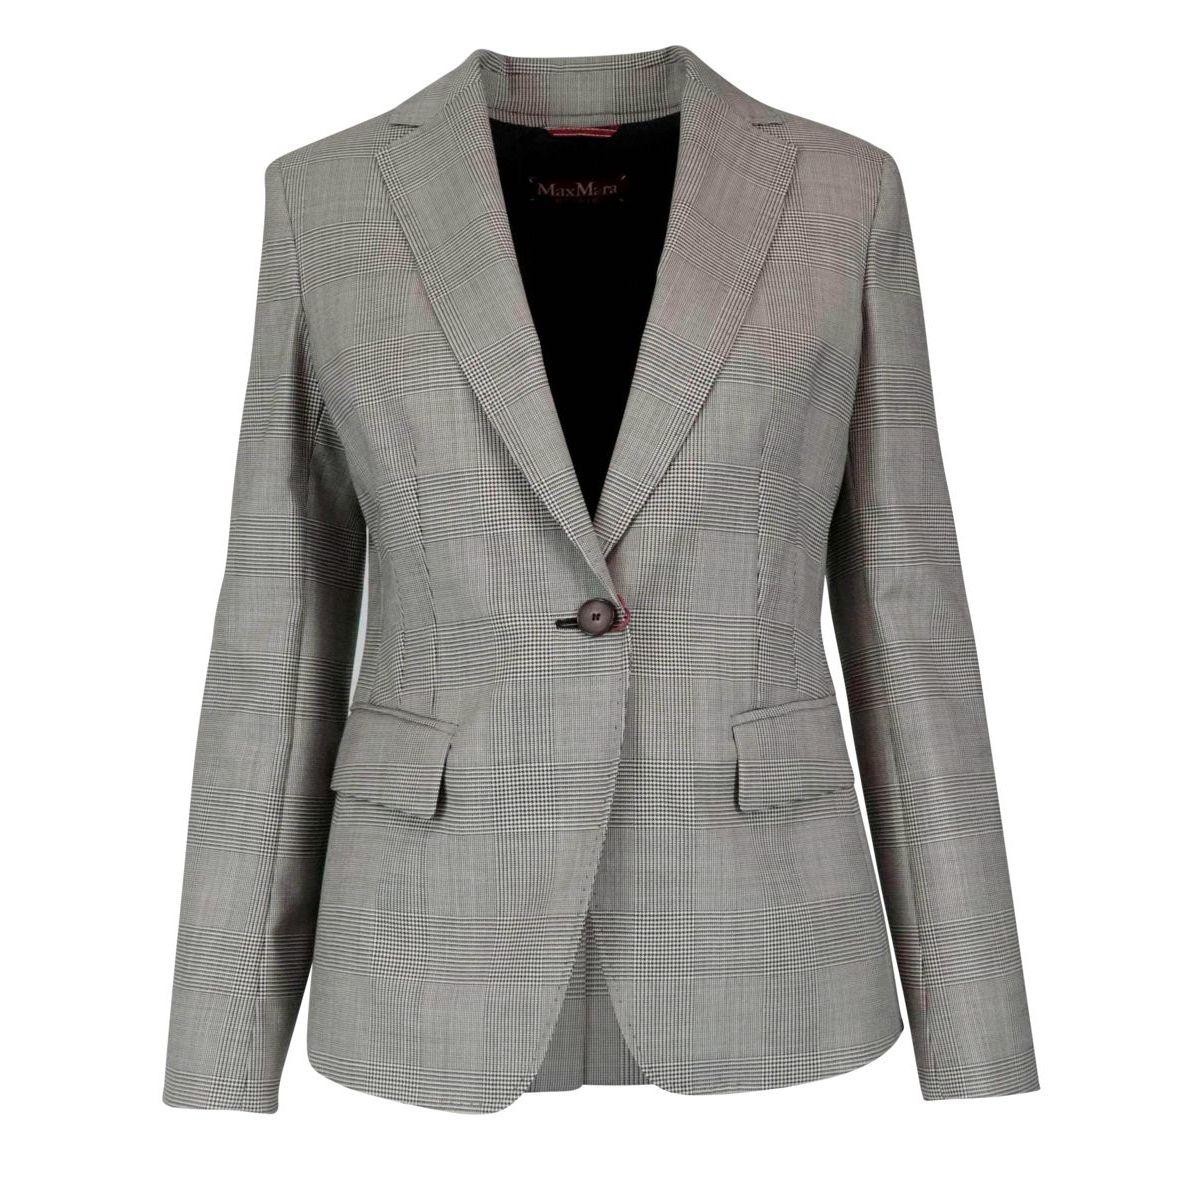 Massimo virgin wool jacket Vichy black / white MAX MARA STUDIO